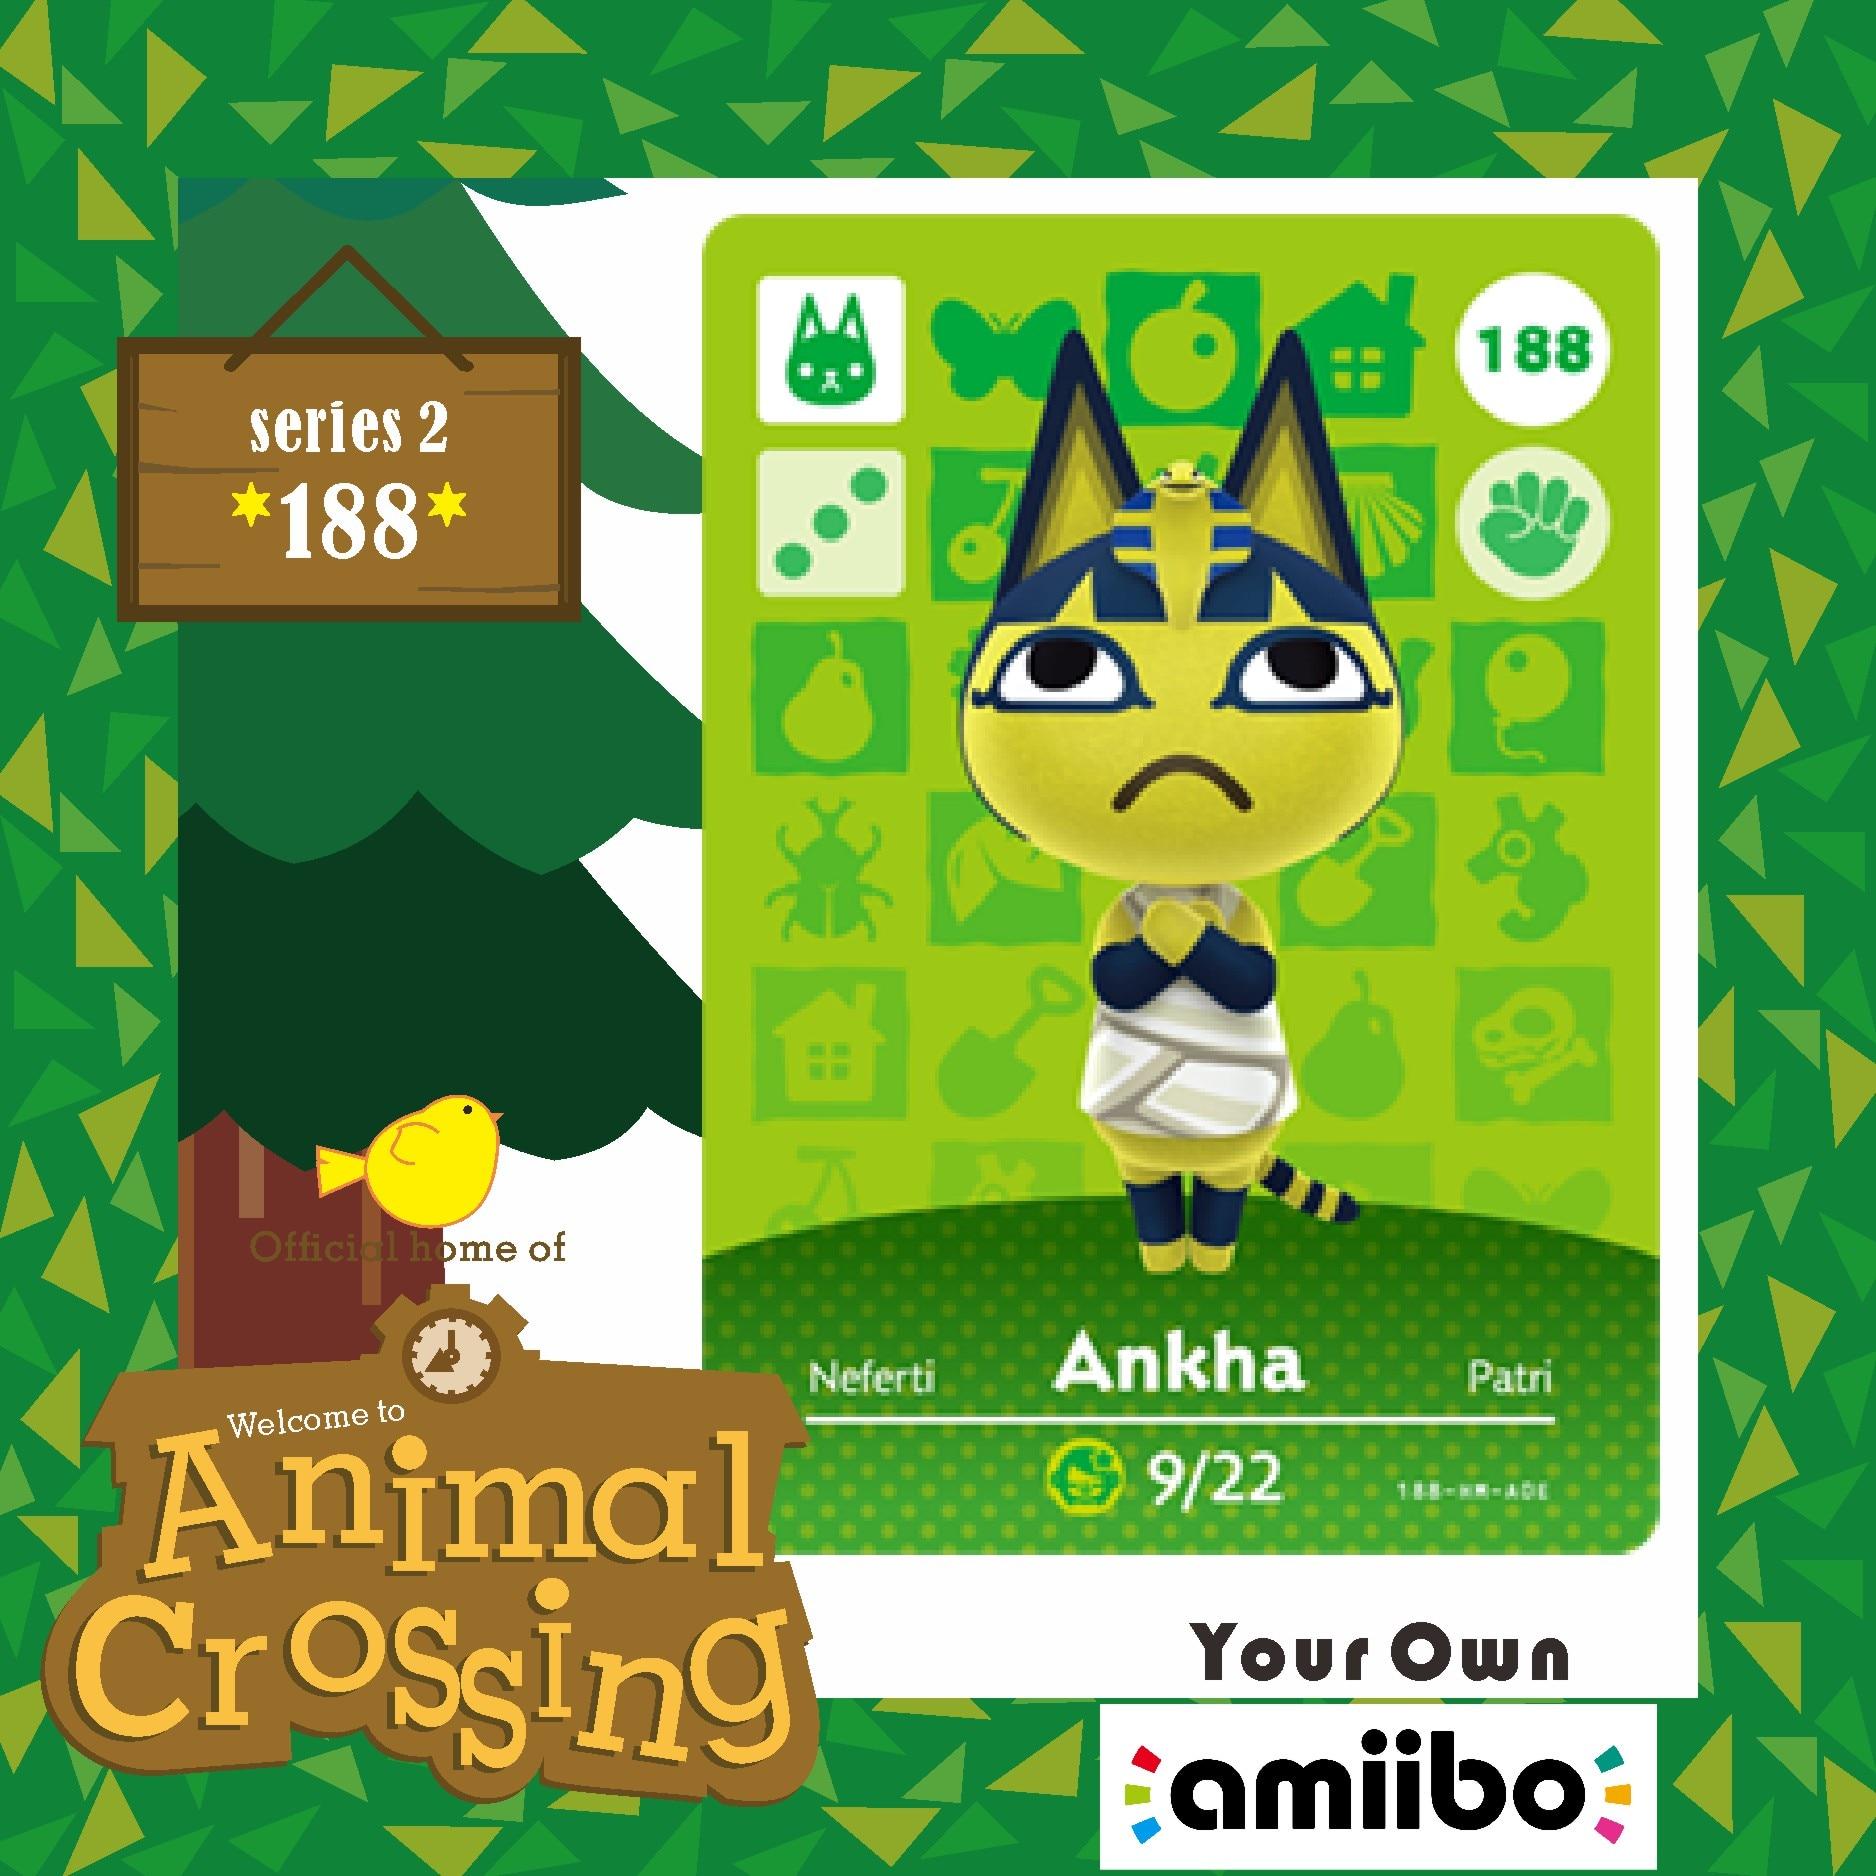 Welcome Amiibo Animal Crossing New Horizons Villager Card Amiibo Animal Crossing Amiibo Ankha 188 for NS Game Season Series 2 1